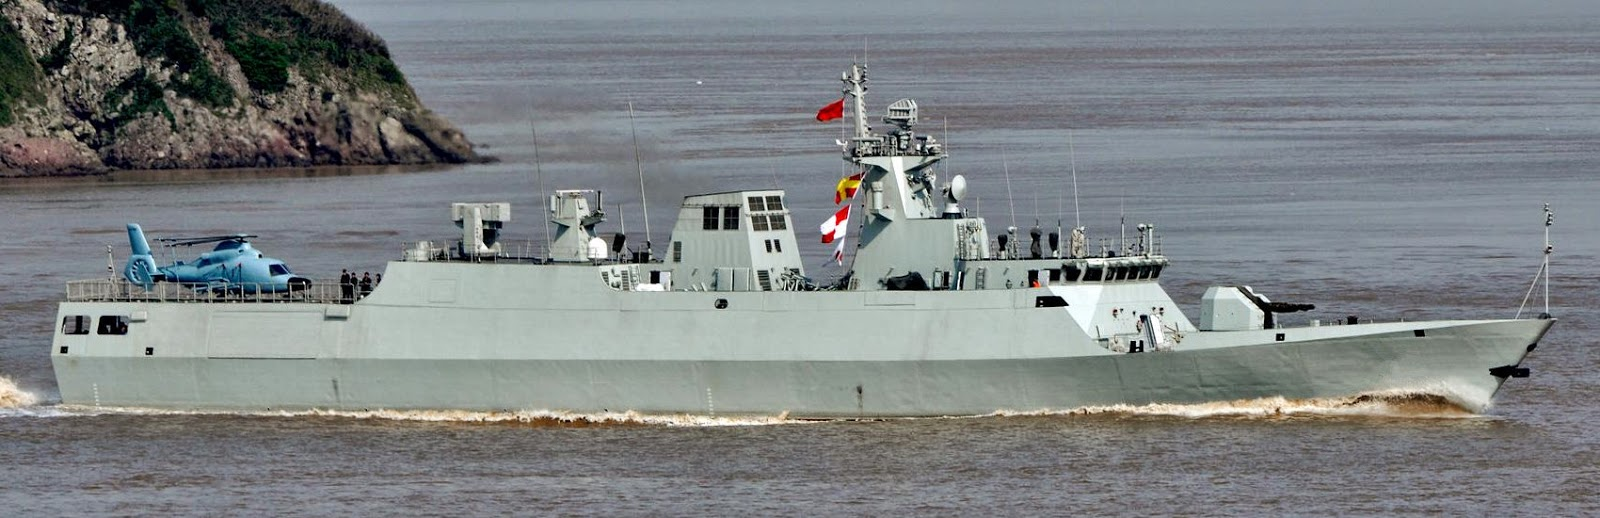 Type 056 corvette